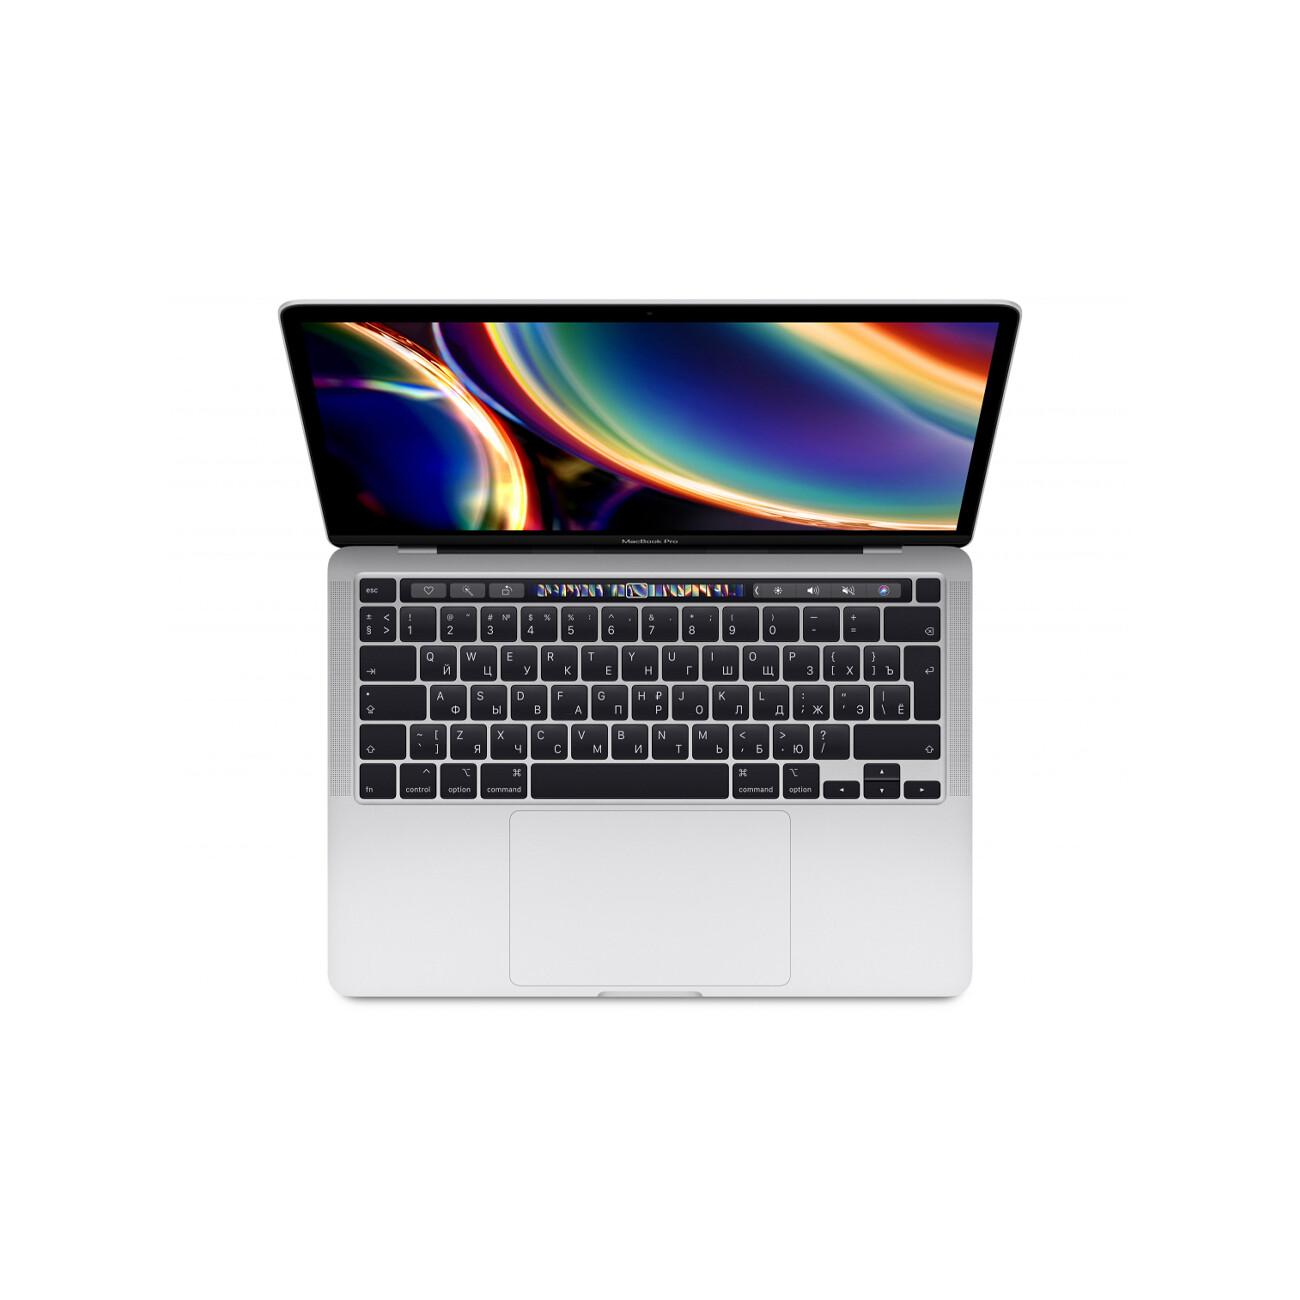 "Apple MacBook Pro 13"" QC i5 1,4 ГГц, 8 ГБ, 256 ГБ SSD, Iris Plus 645, Touch Bar, серебристый"